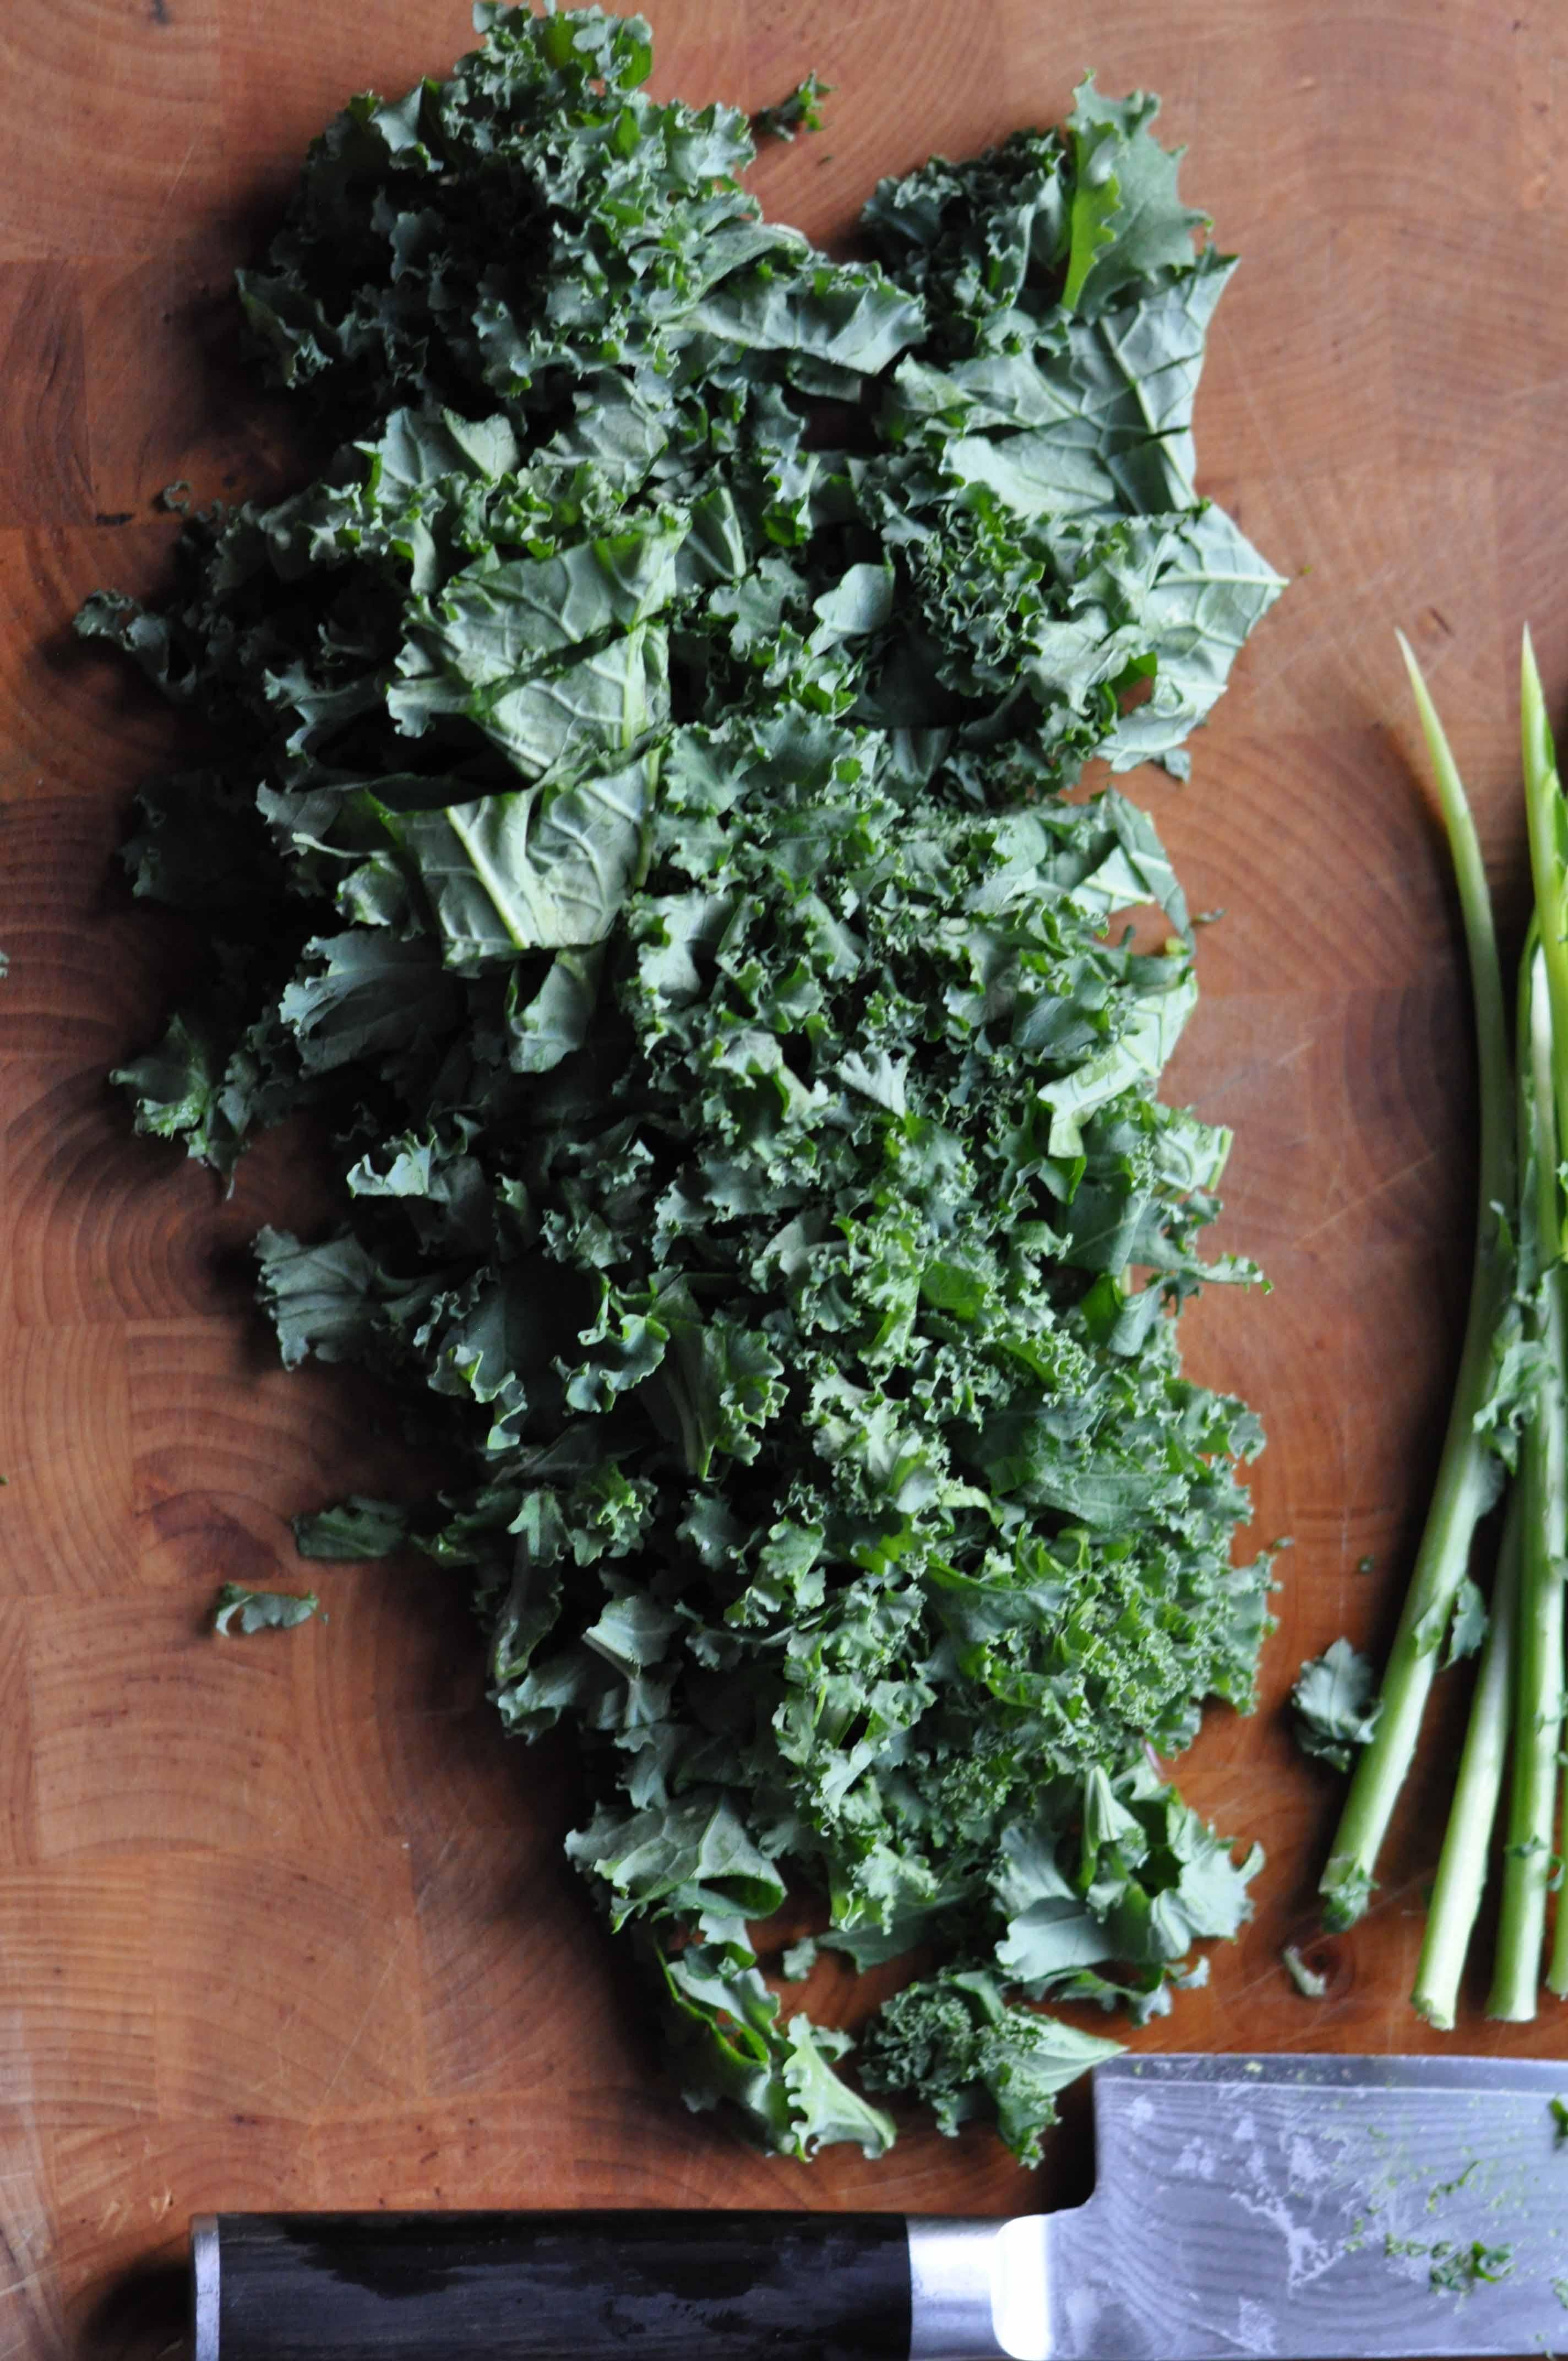 Kale good or bad